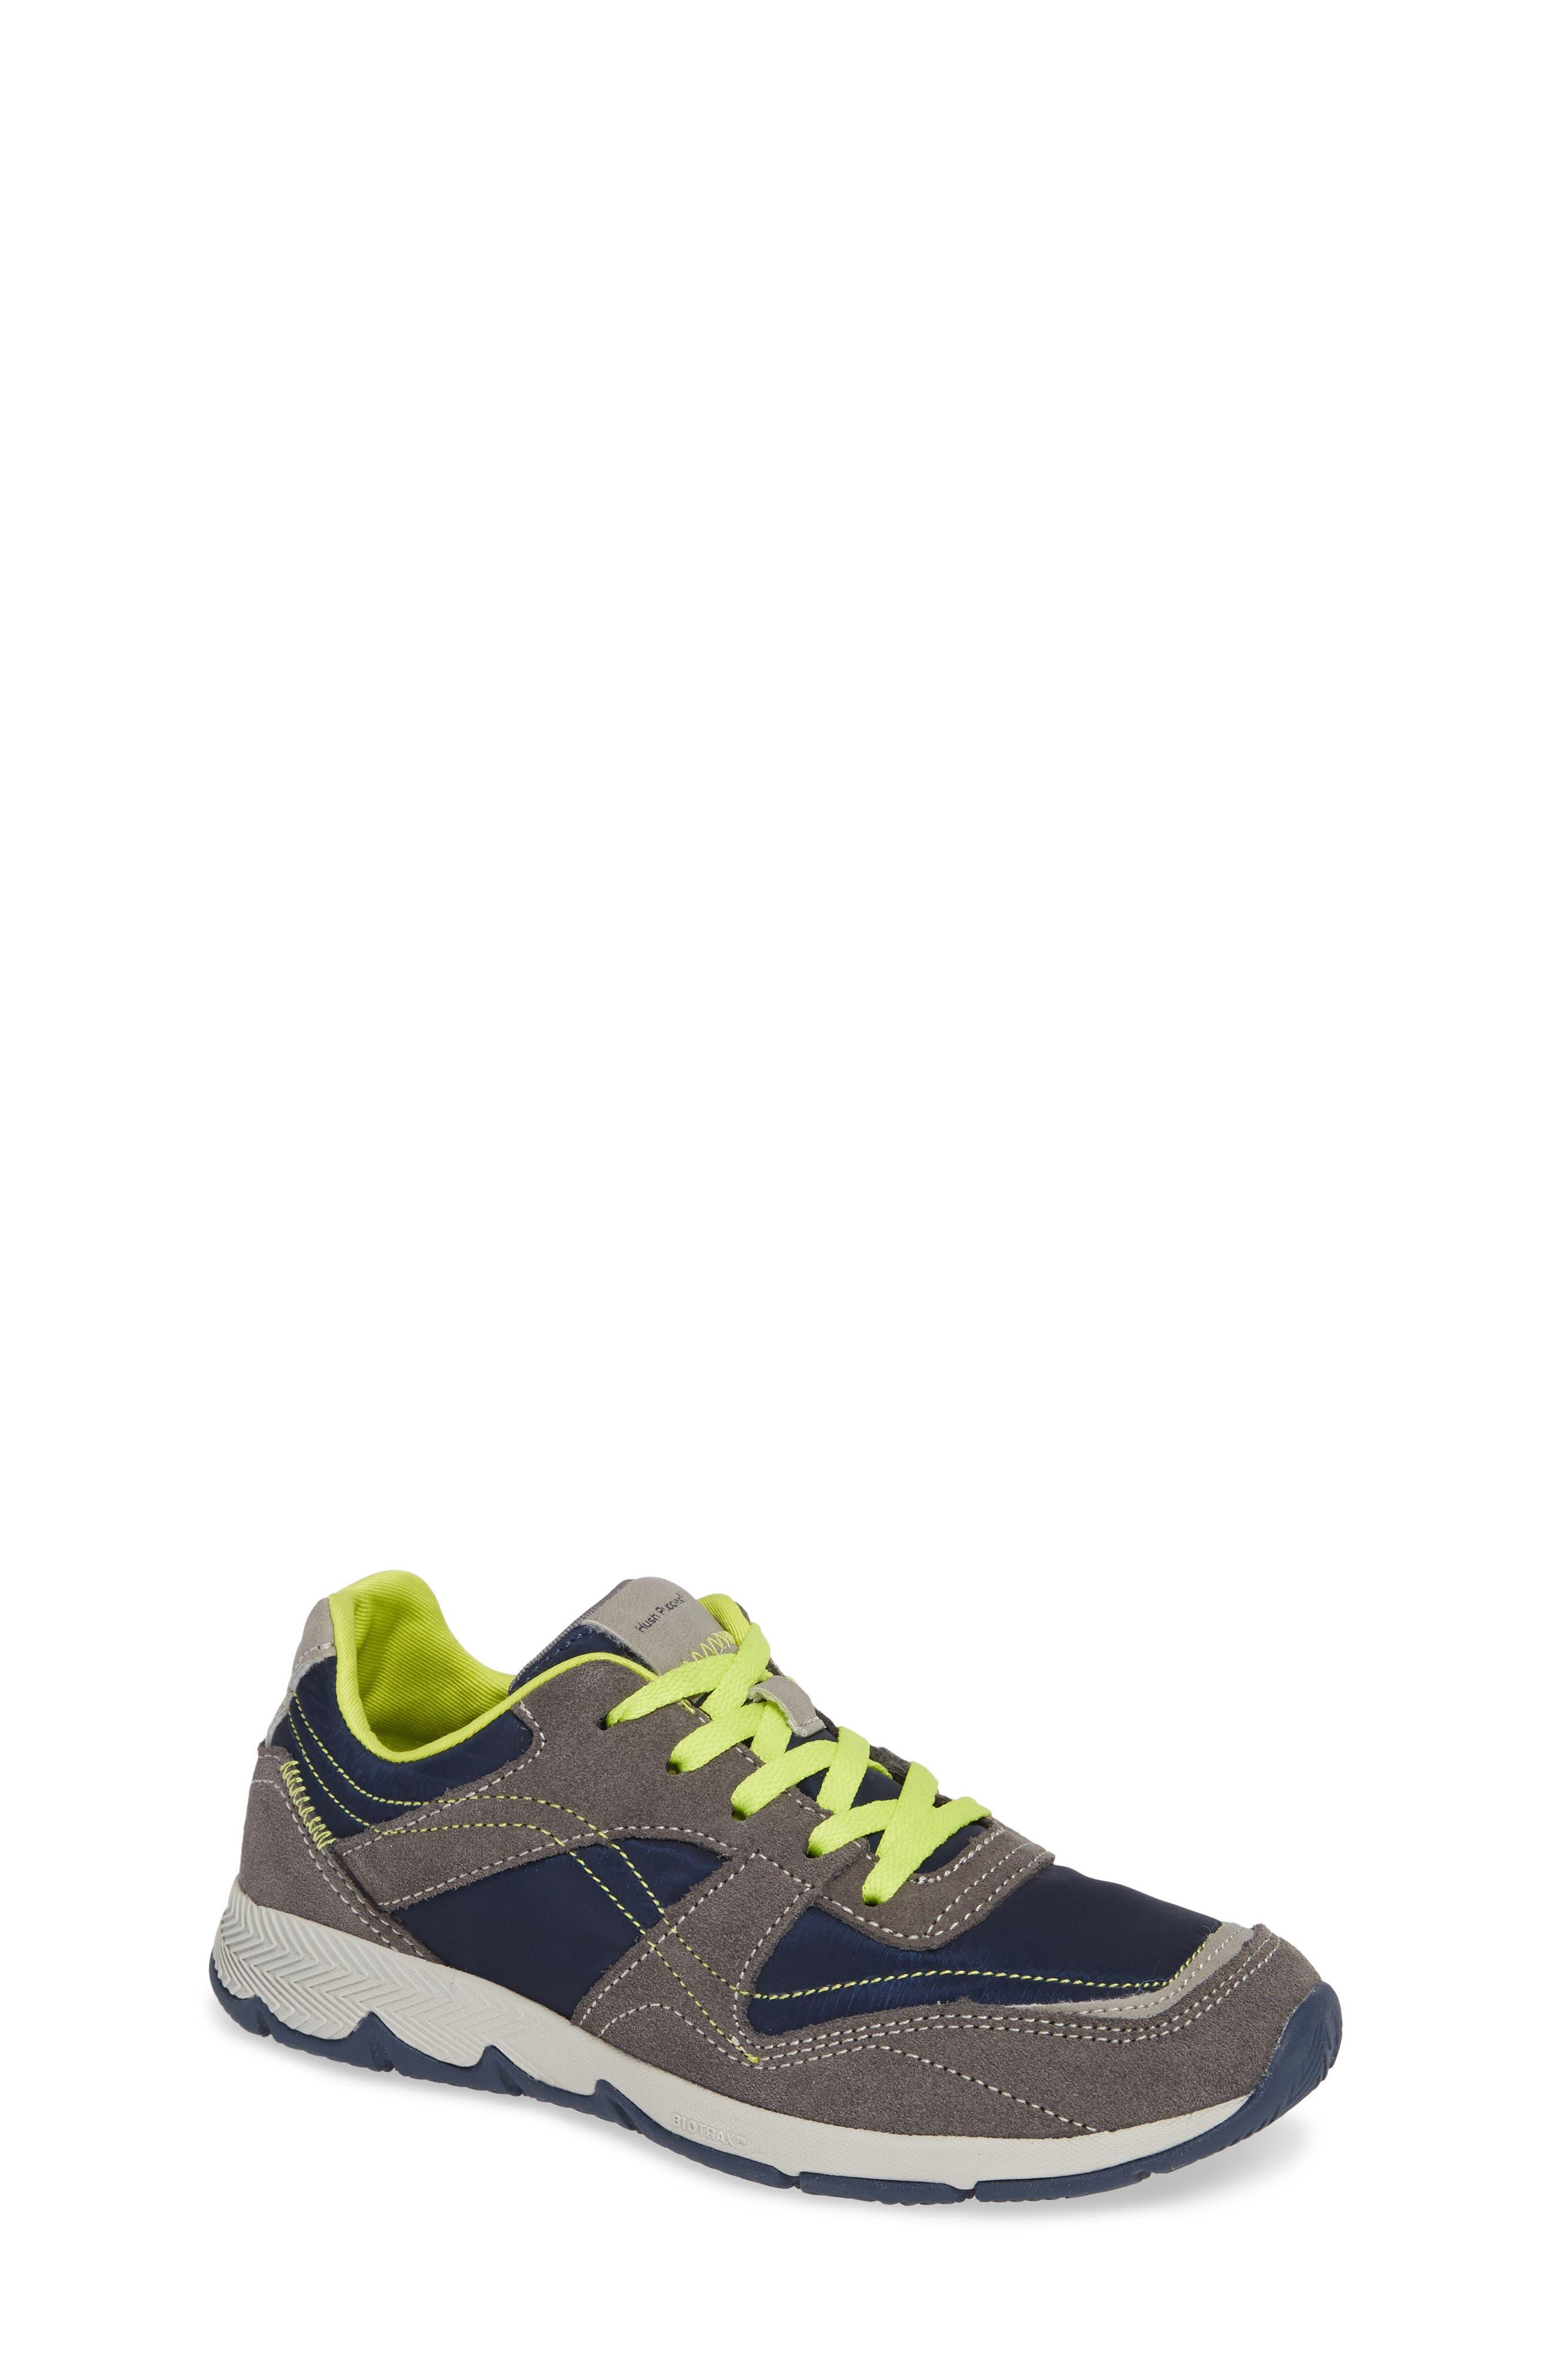 Zev TS Field Sneaker,                             Main thumbnail 1, color,                             GREY/ NAVY